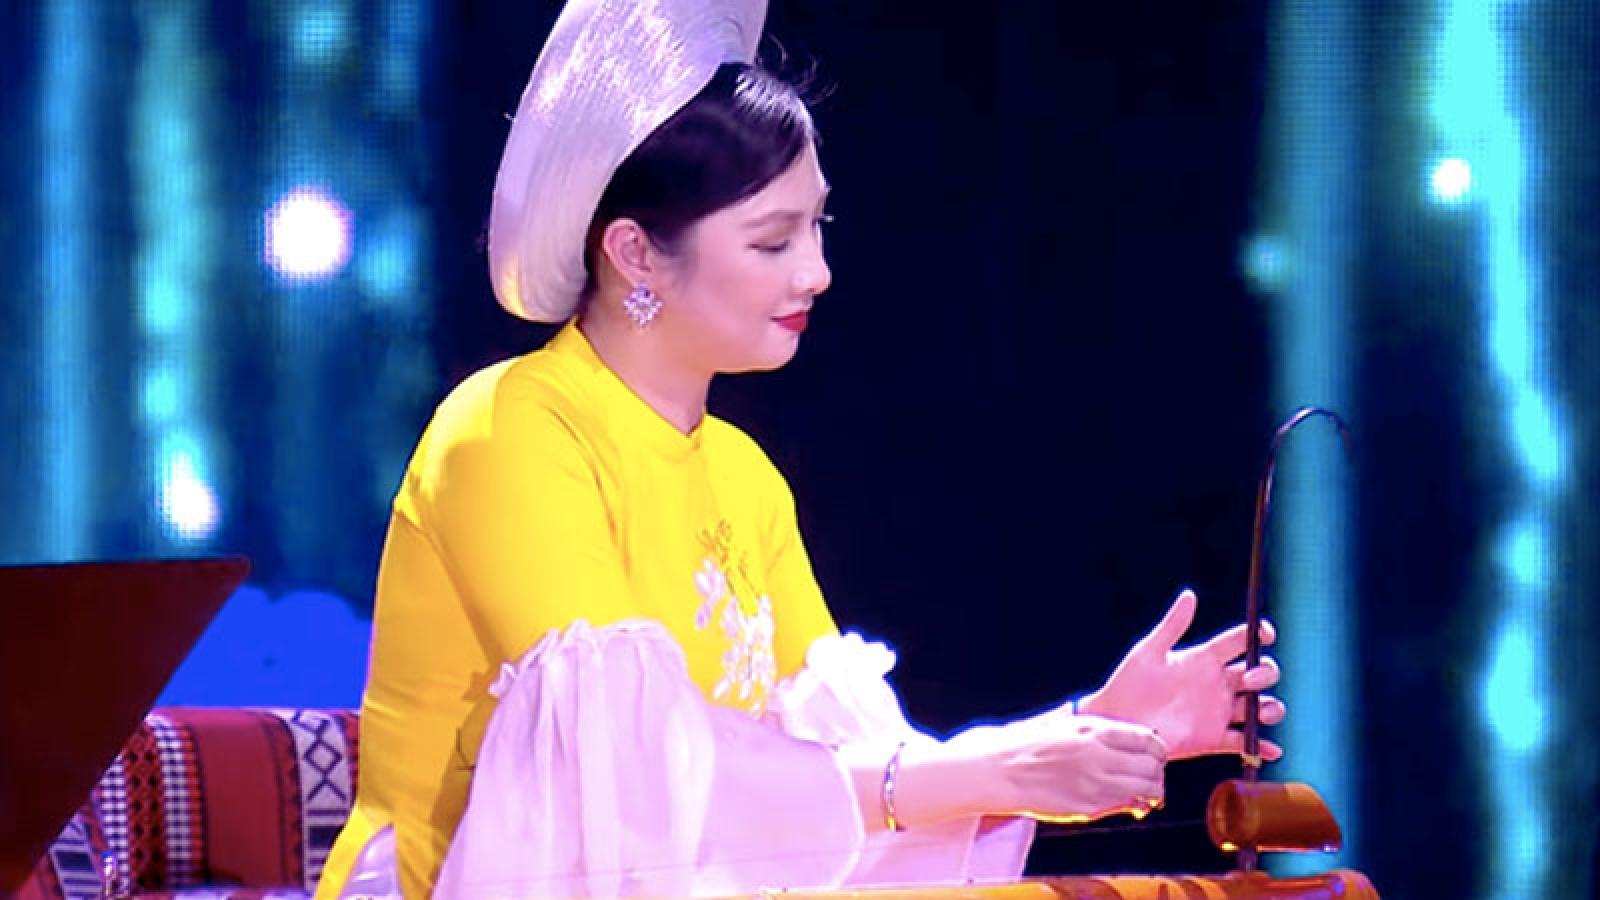 Vietnam's Dan Bau performance impresses visitors at Expo 2020 Dubai